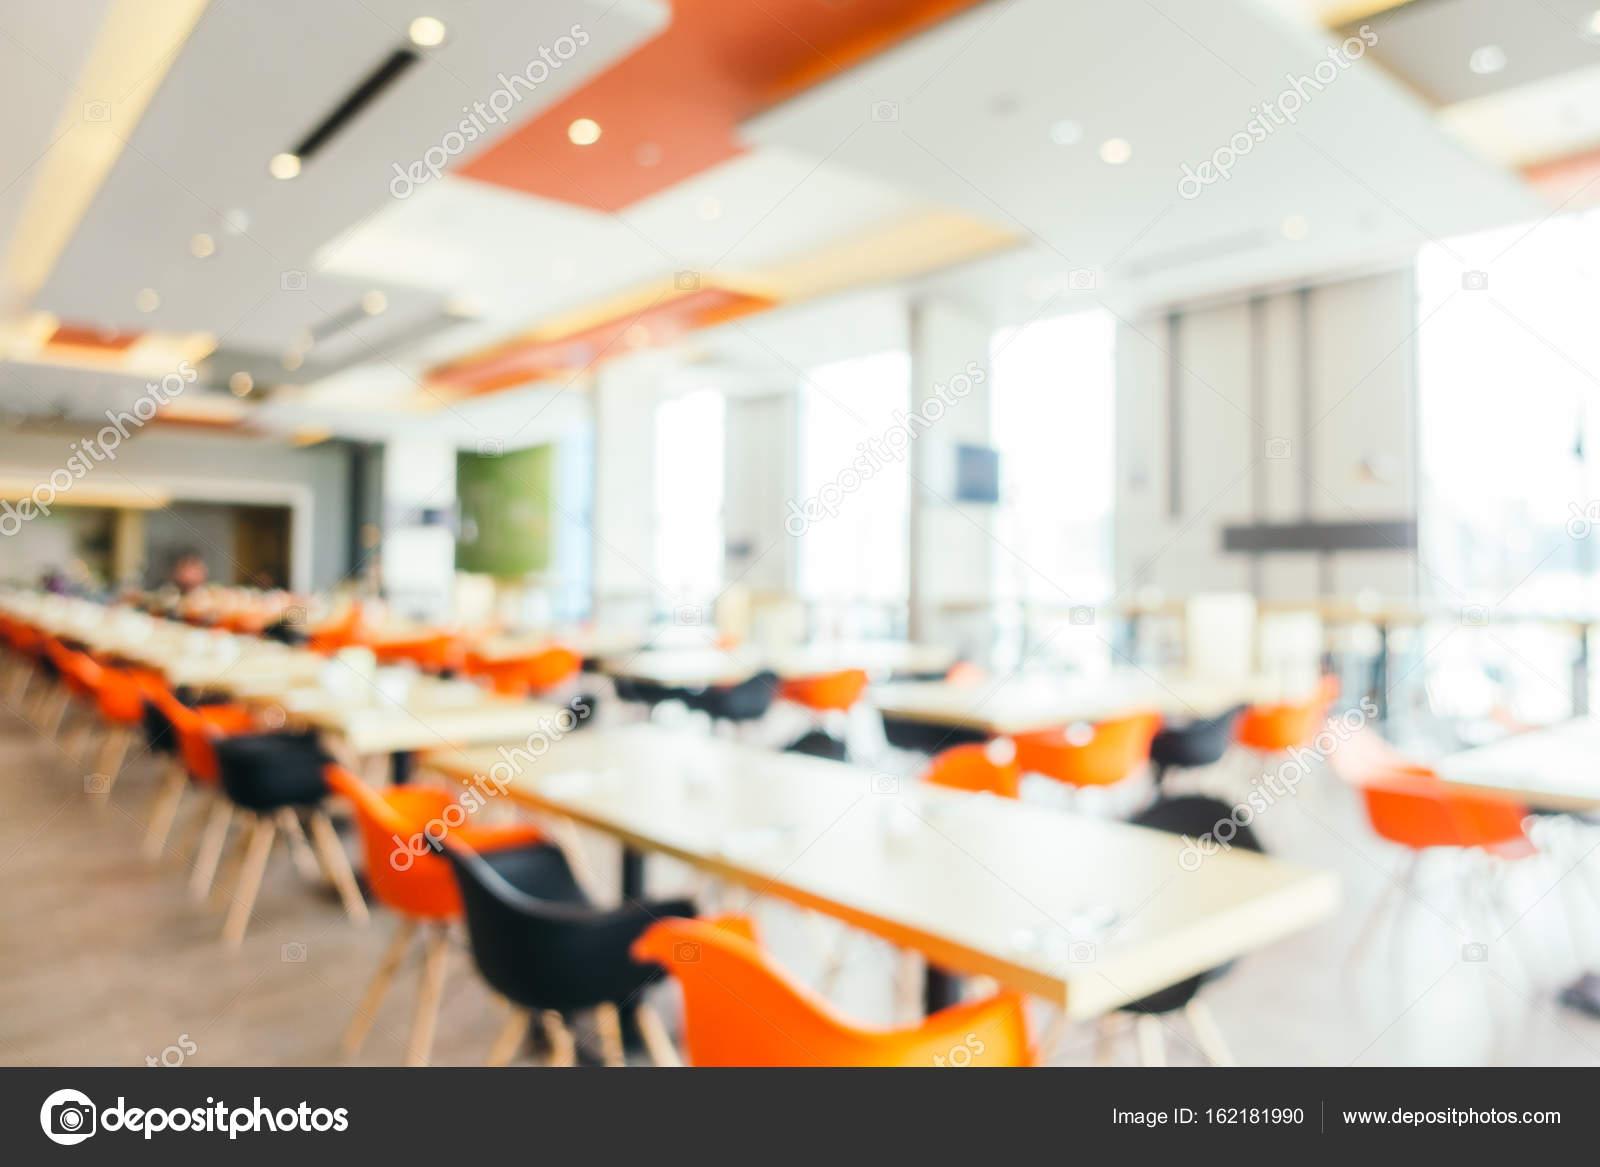 Resumen restaurante de Blur — Fotos de Stock © mrsiraphol #162181990